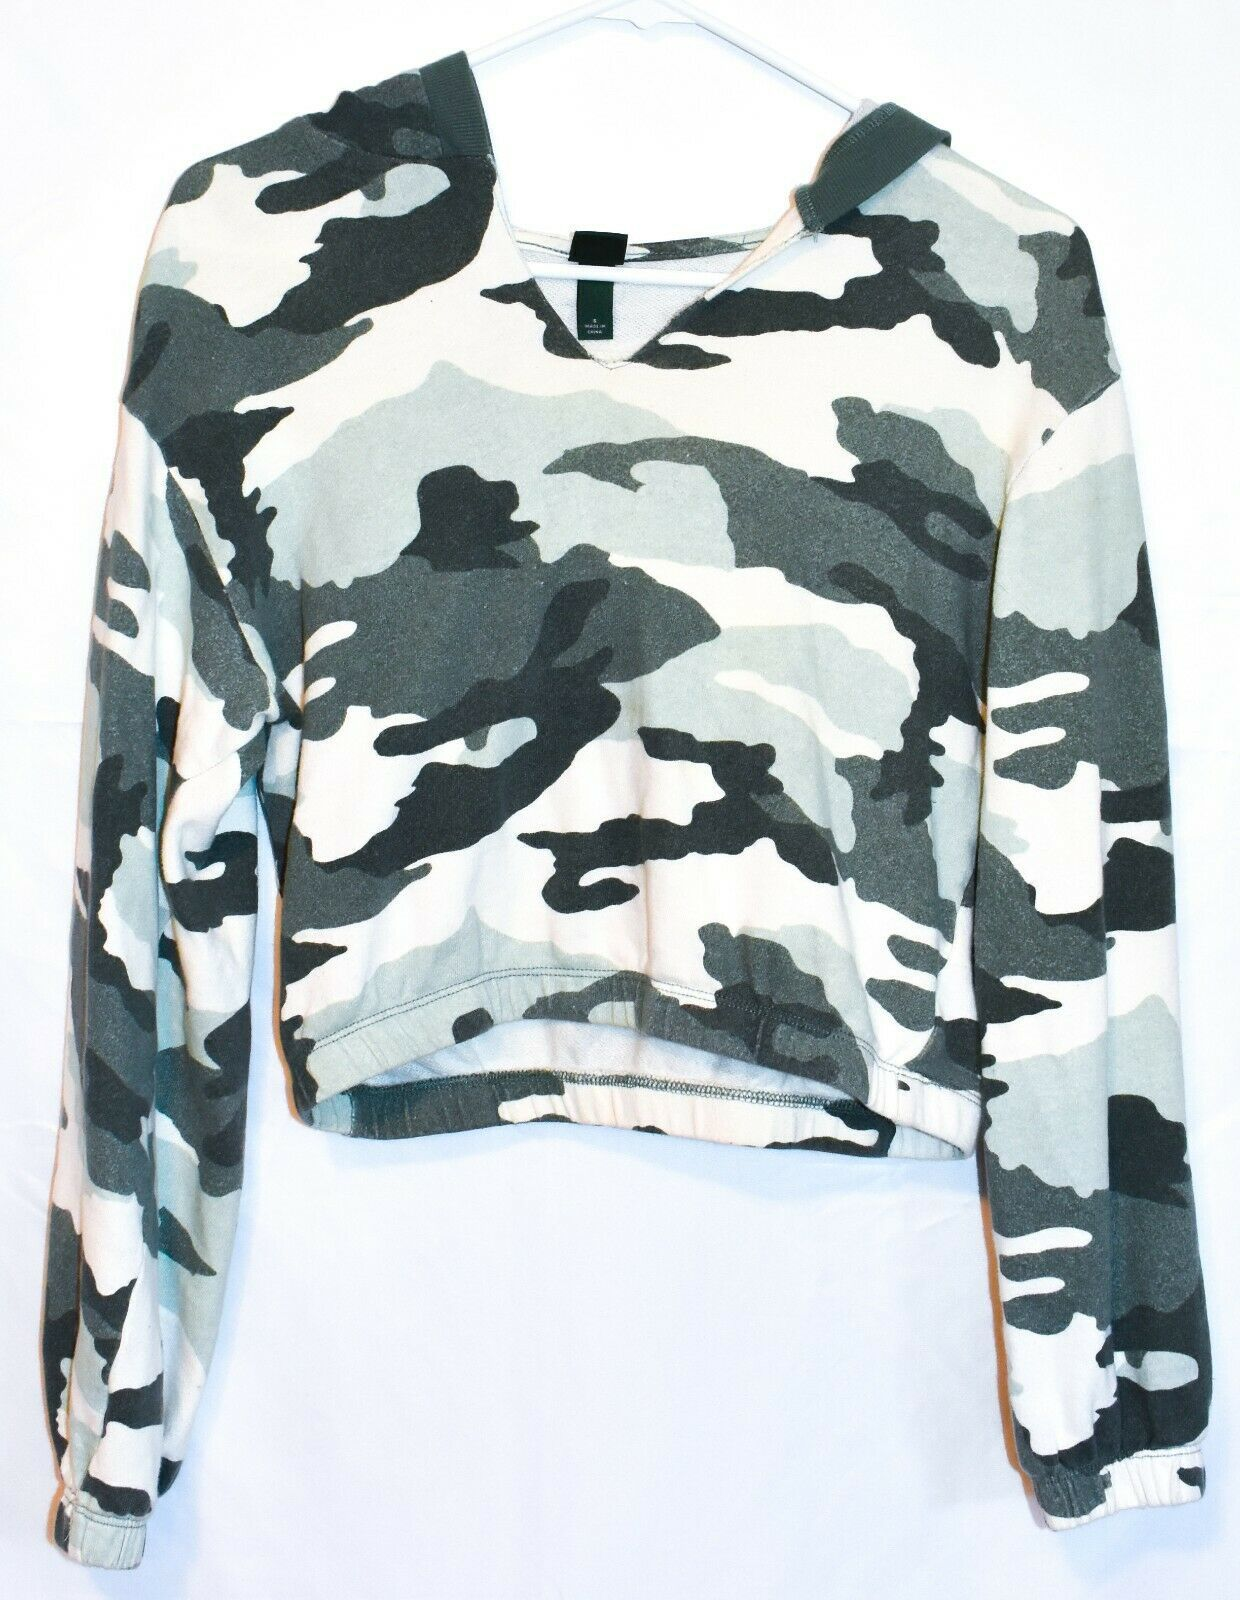 Wild Fable Women's Green & White Camo Print V-Neck Crop Hoodie Sweatshirt Size S